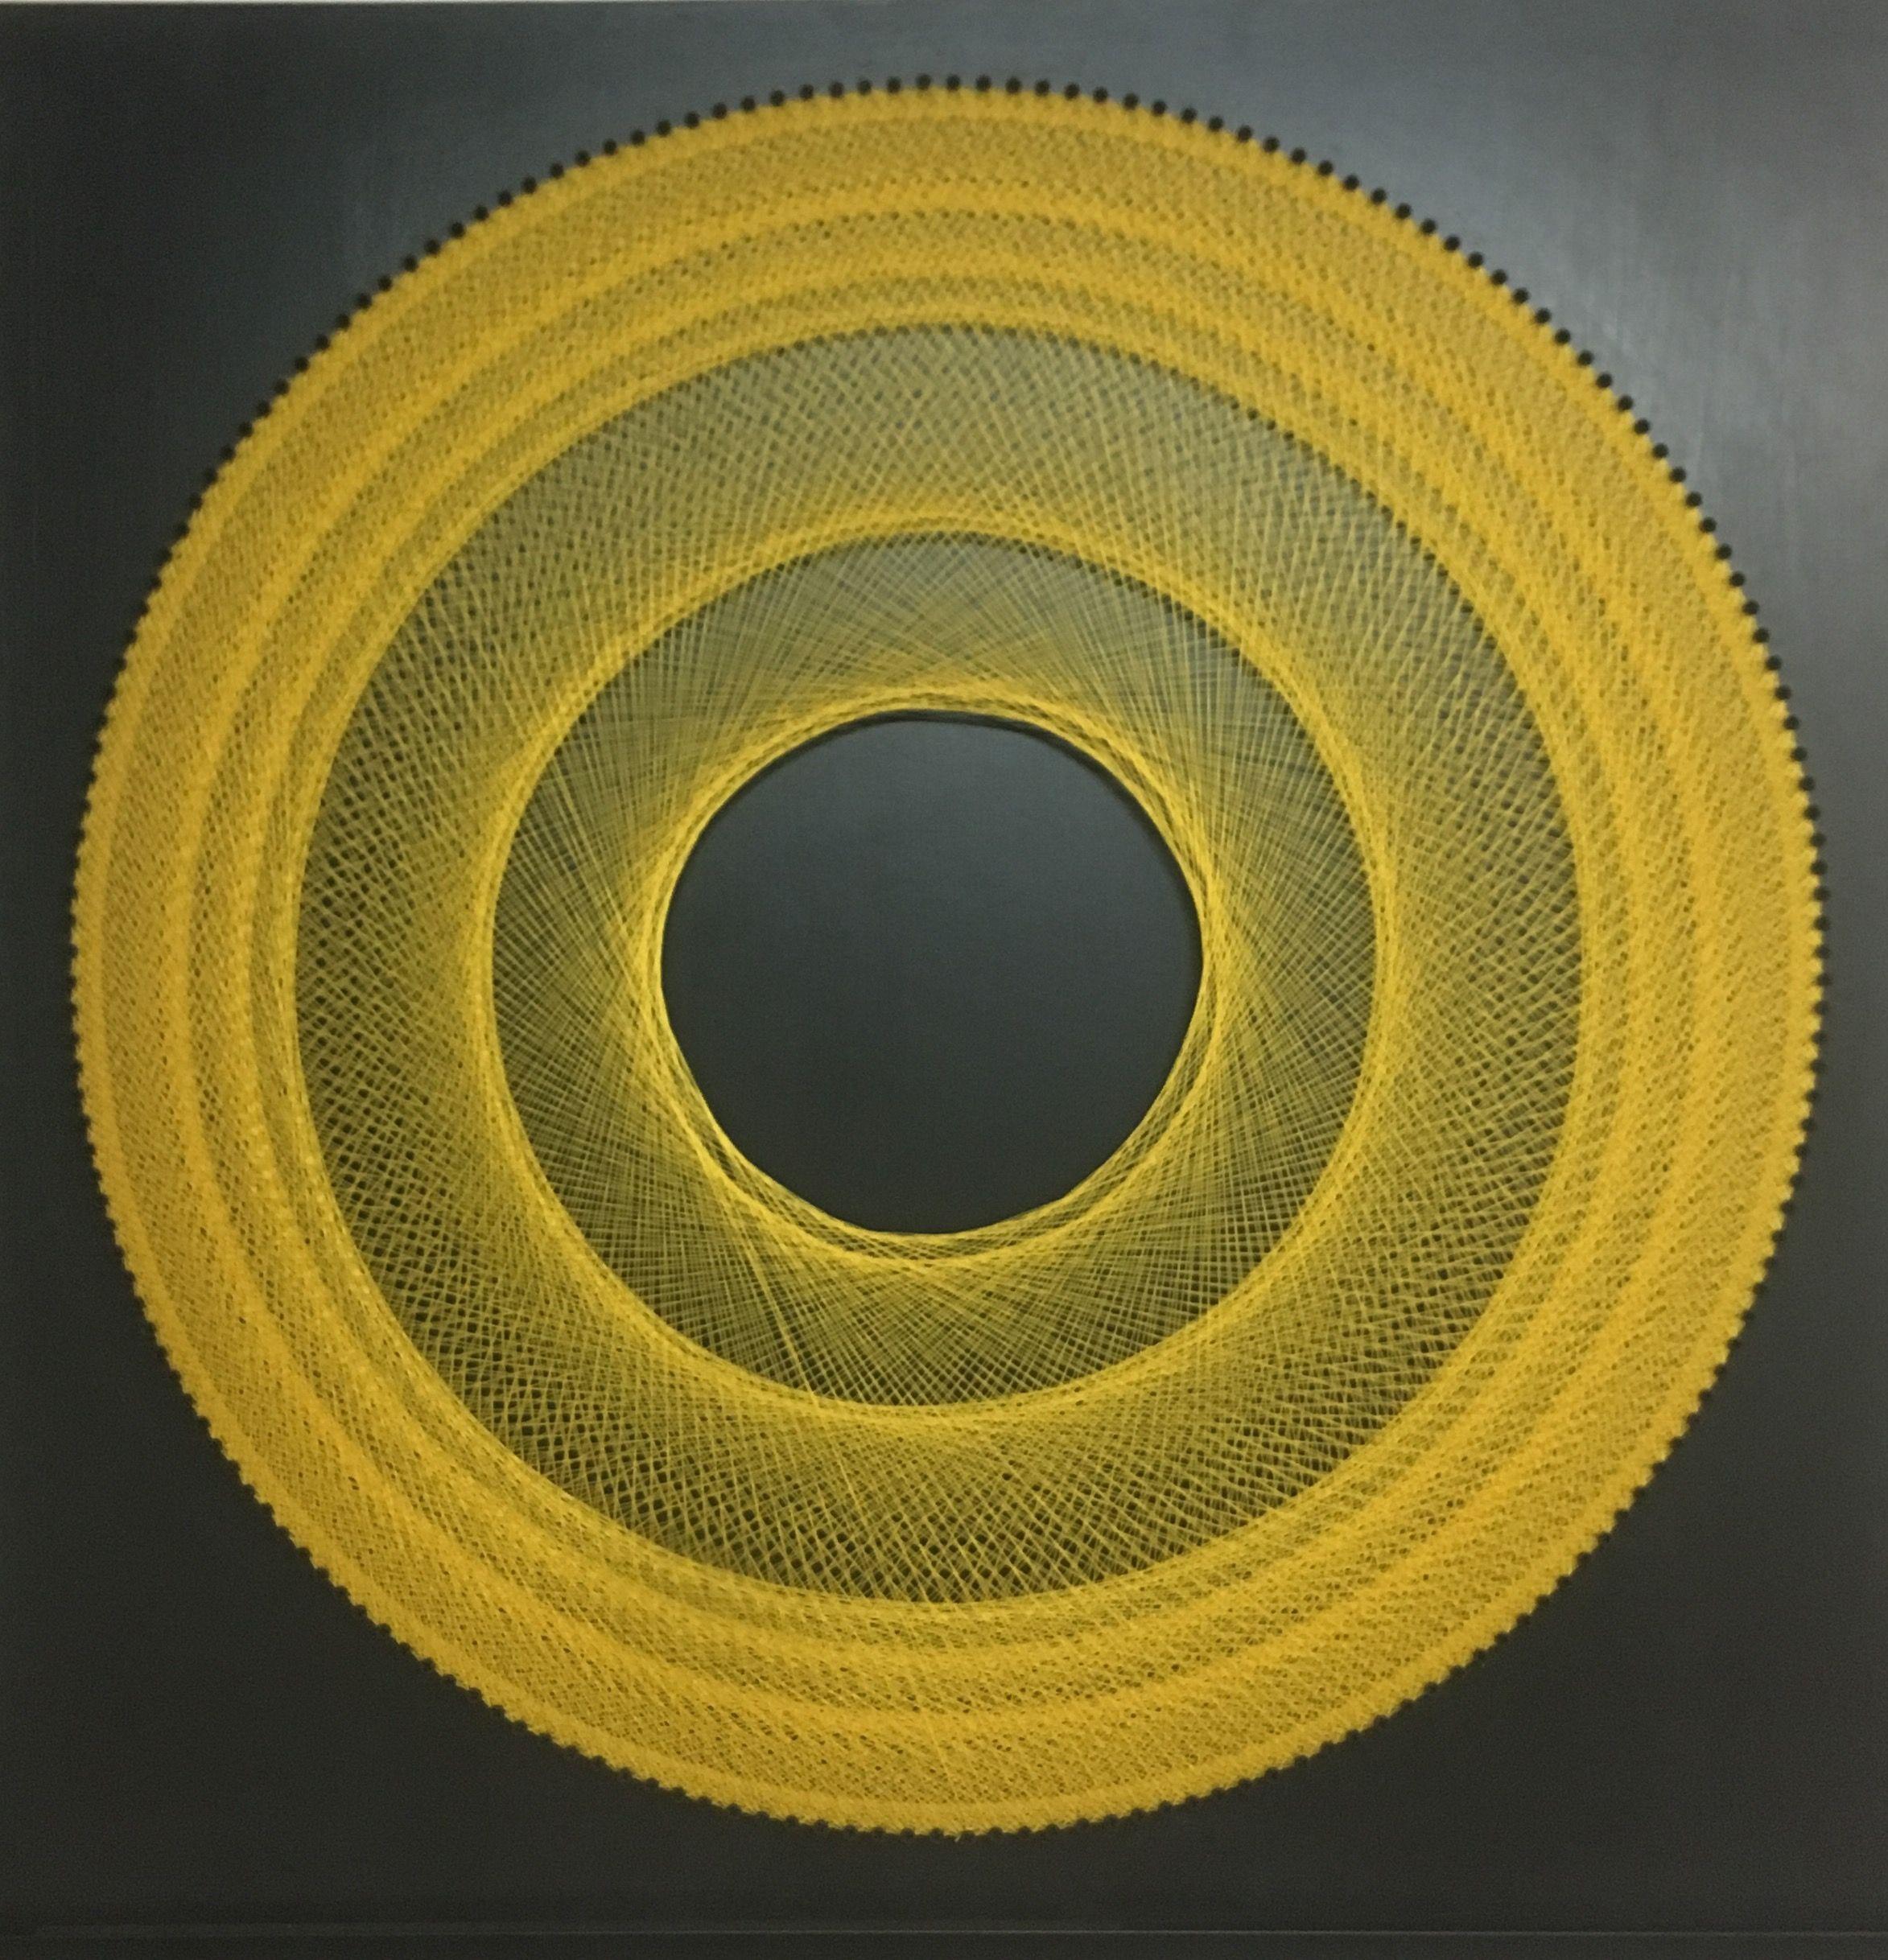 Graphic Circle Thread Art Yellow Mandala Concentric Circle Yellow On